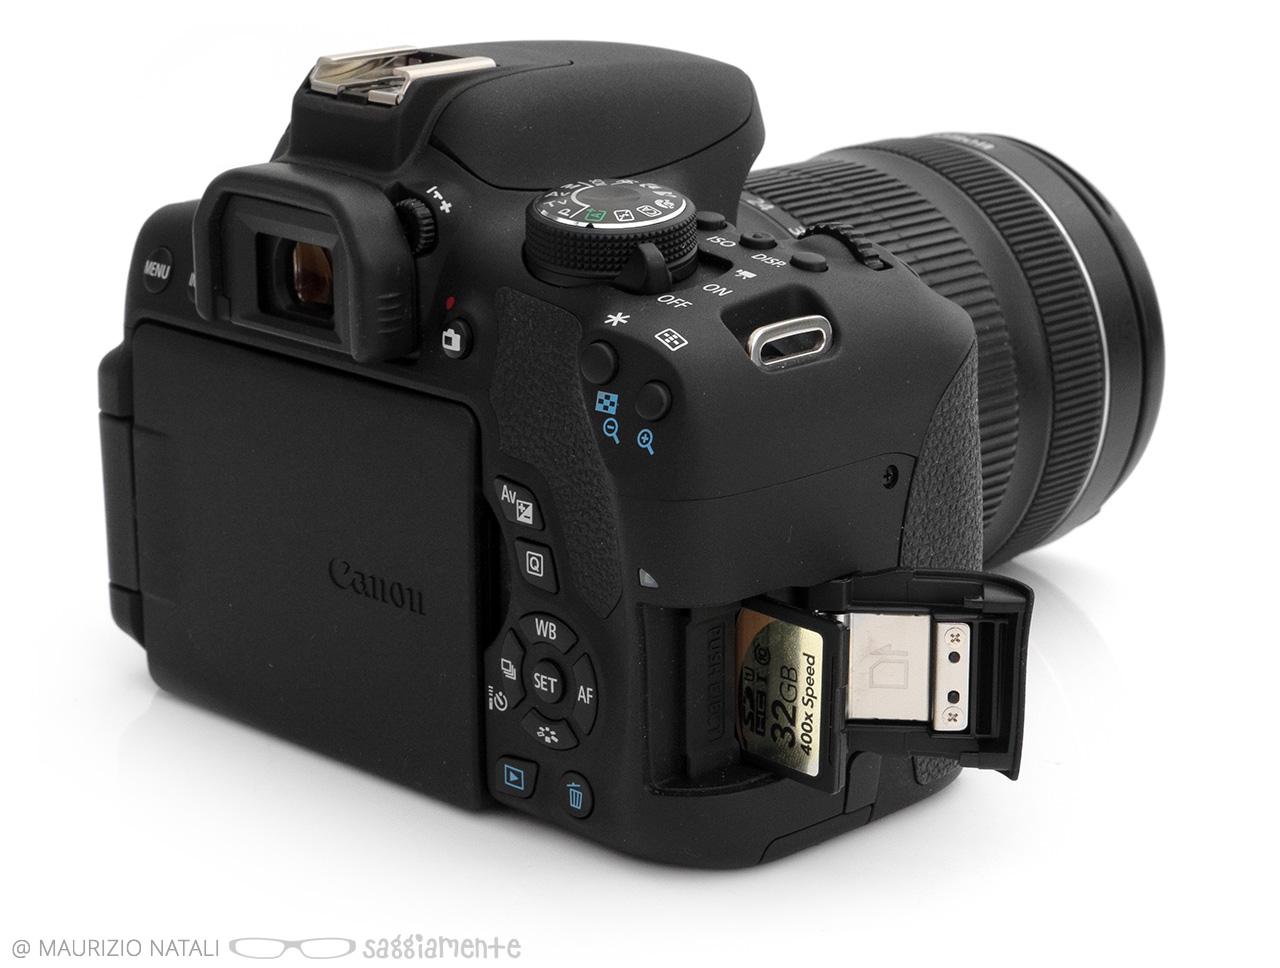 Recensione Canon 750d E 760d La Ribelle Si Sdoppia Compie Un Eos Kit Ef S18 55mm Is Stm Eos750d 750 D Memoria